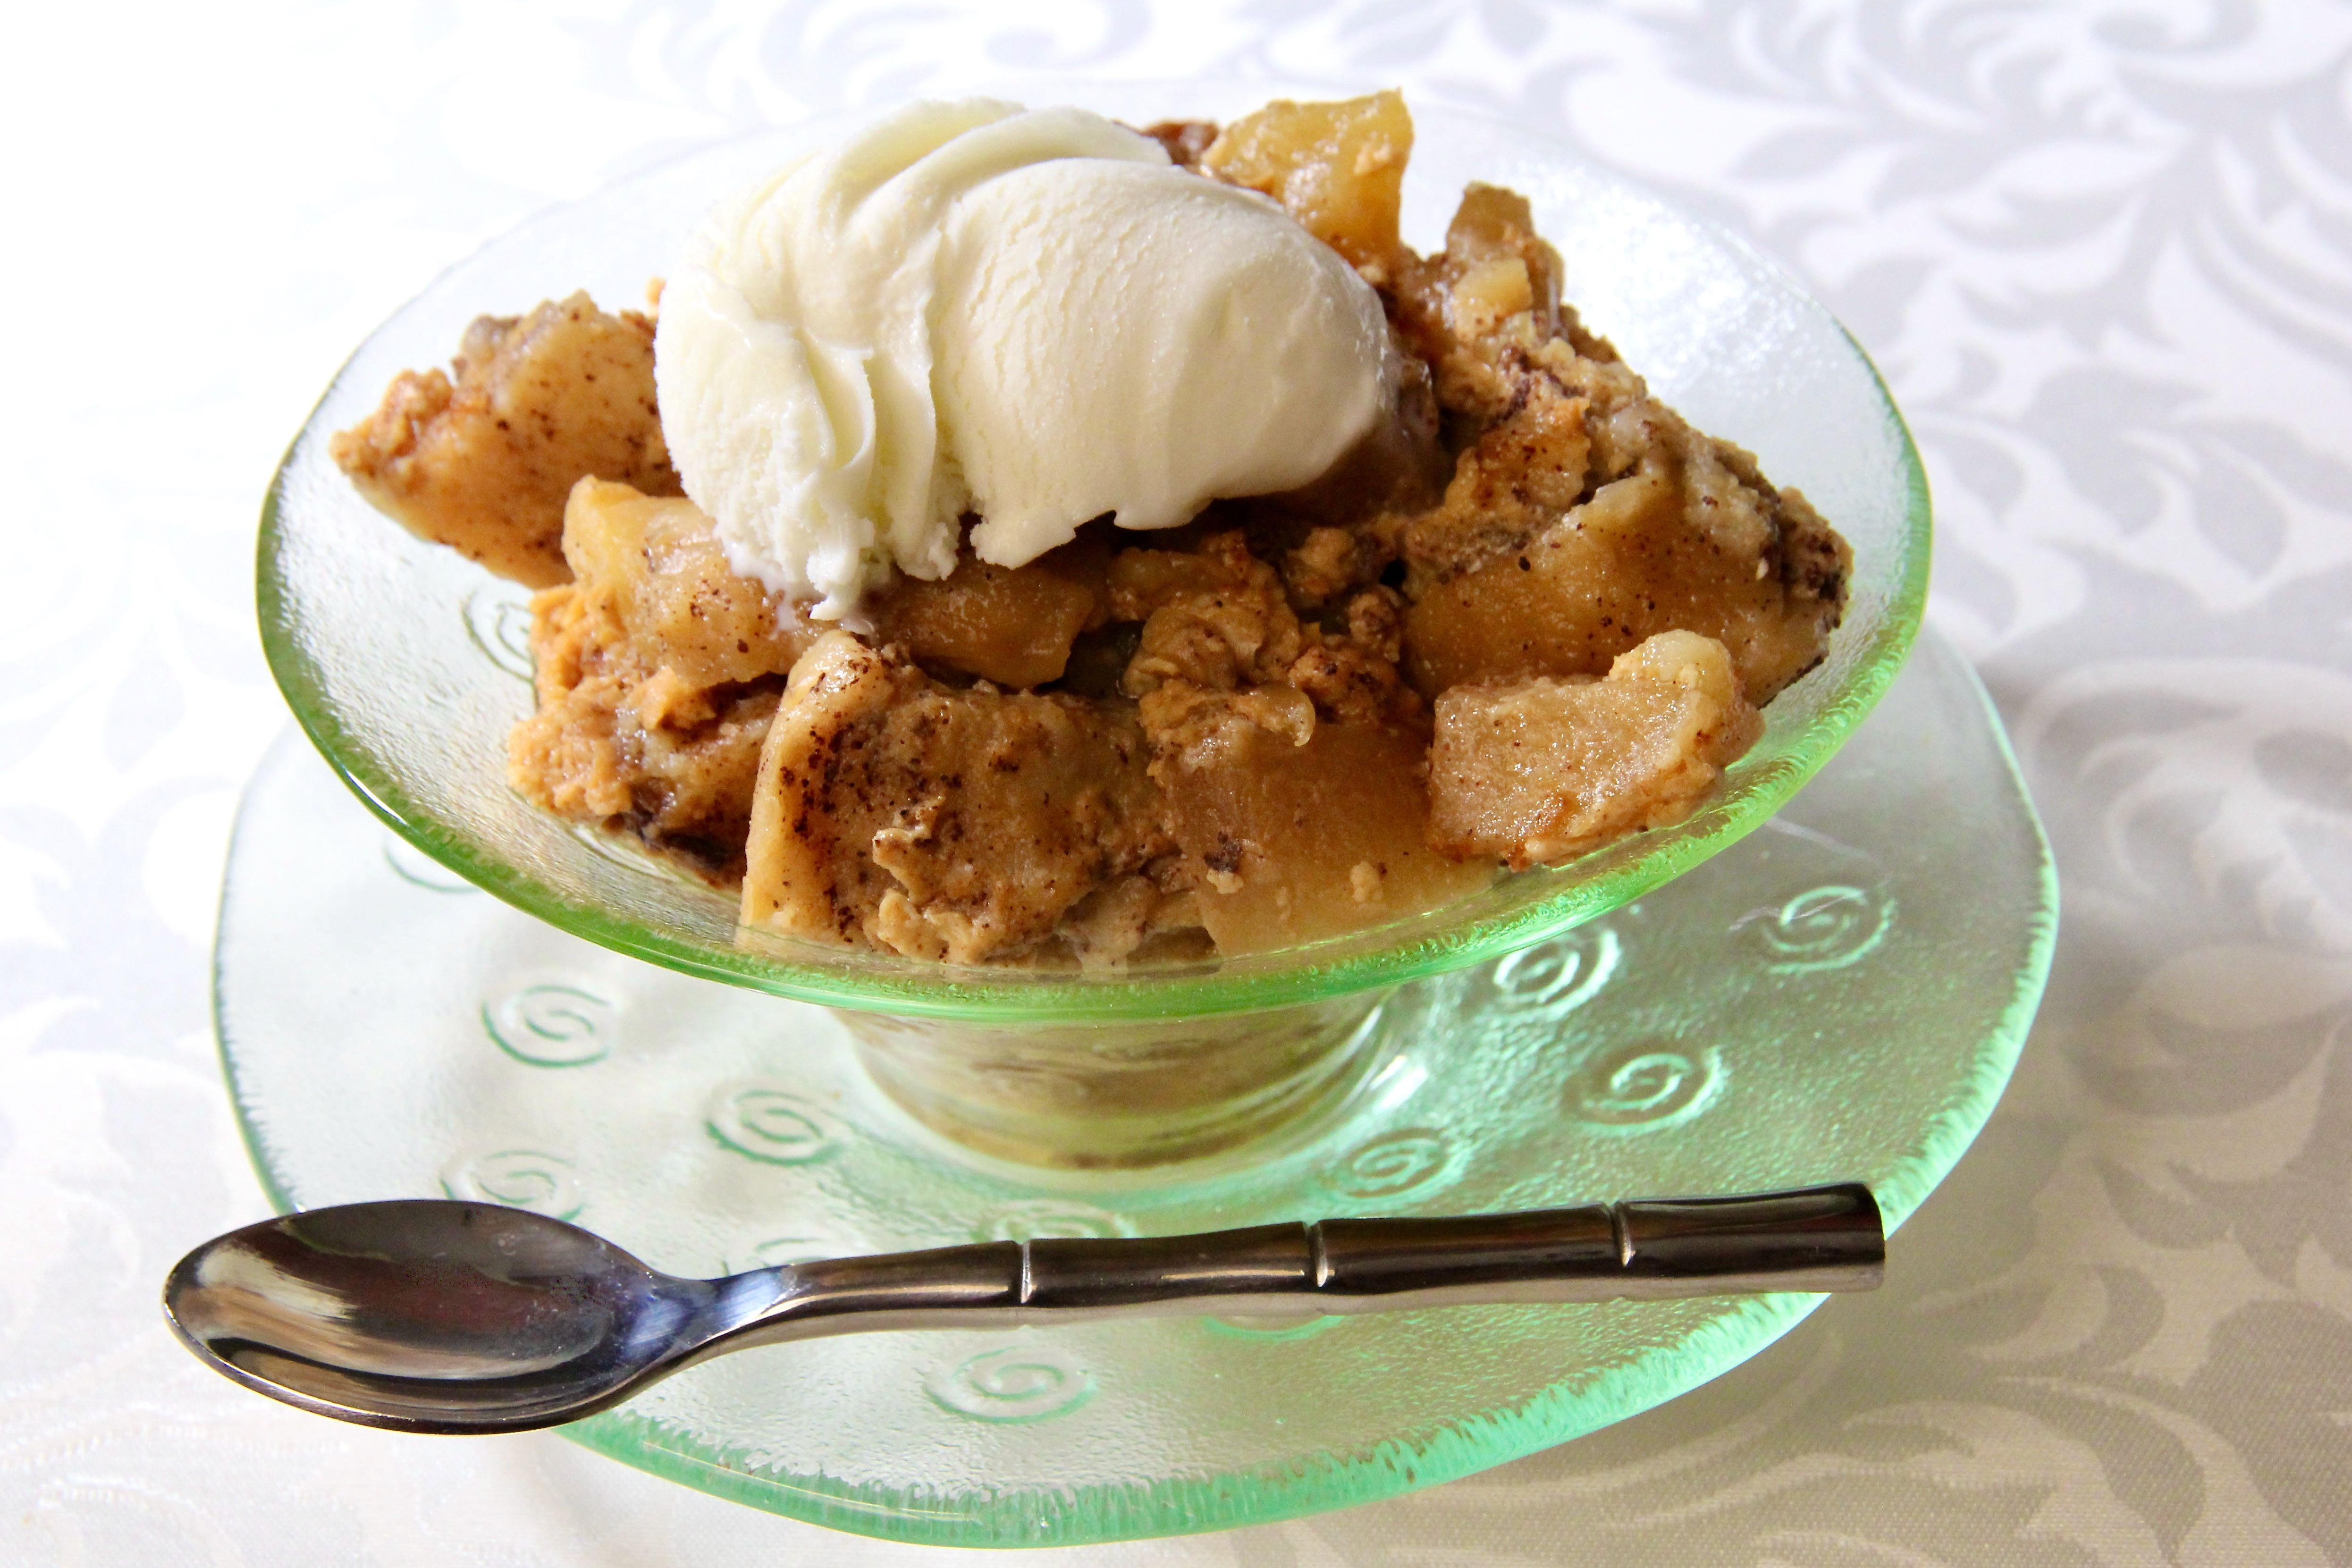 Slow Cooker Apple Cinnamon Bread Pudding